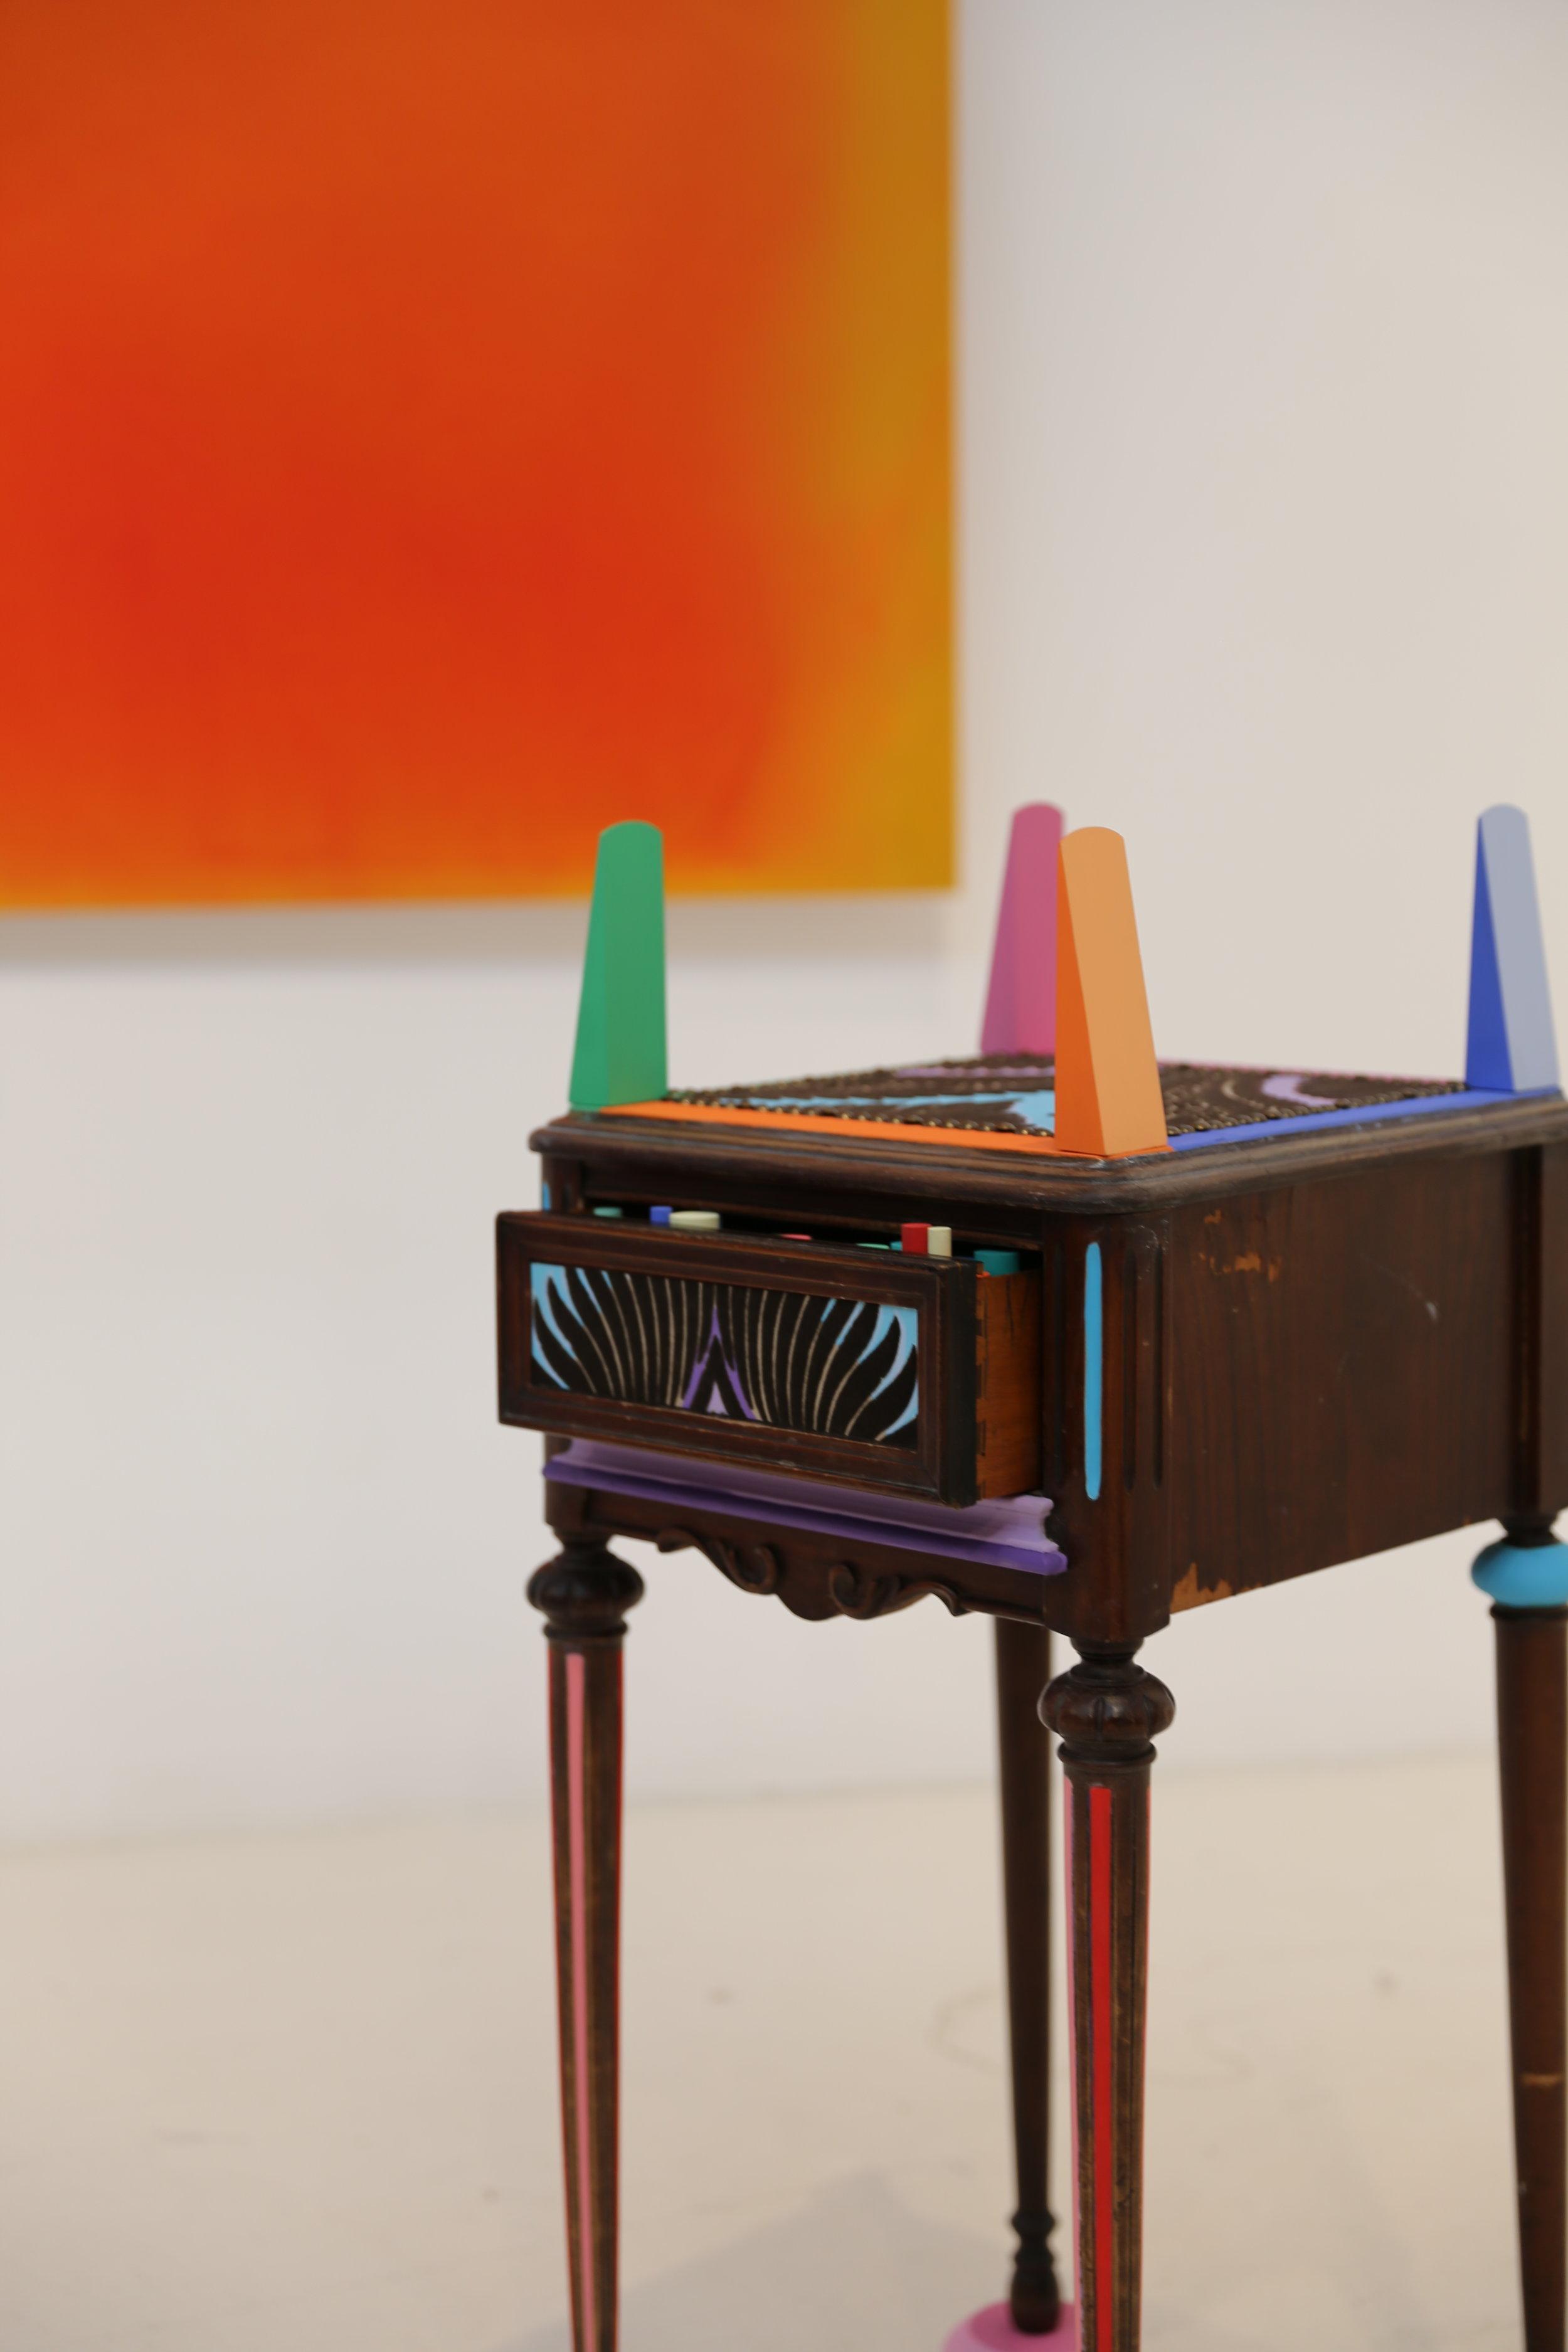 Breathing Colours_Installation_Works by Nuha Saad & Elefteria Vlavianos_Credit_Art Pharmacy_Vandal __3504.JPG